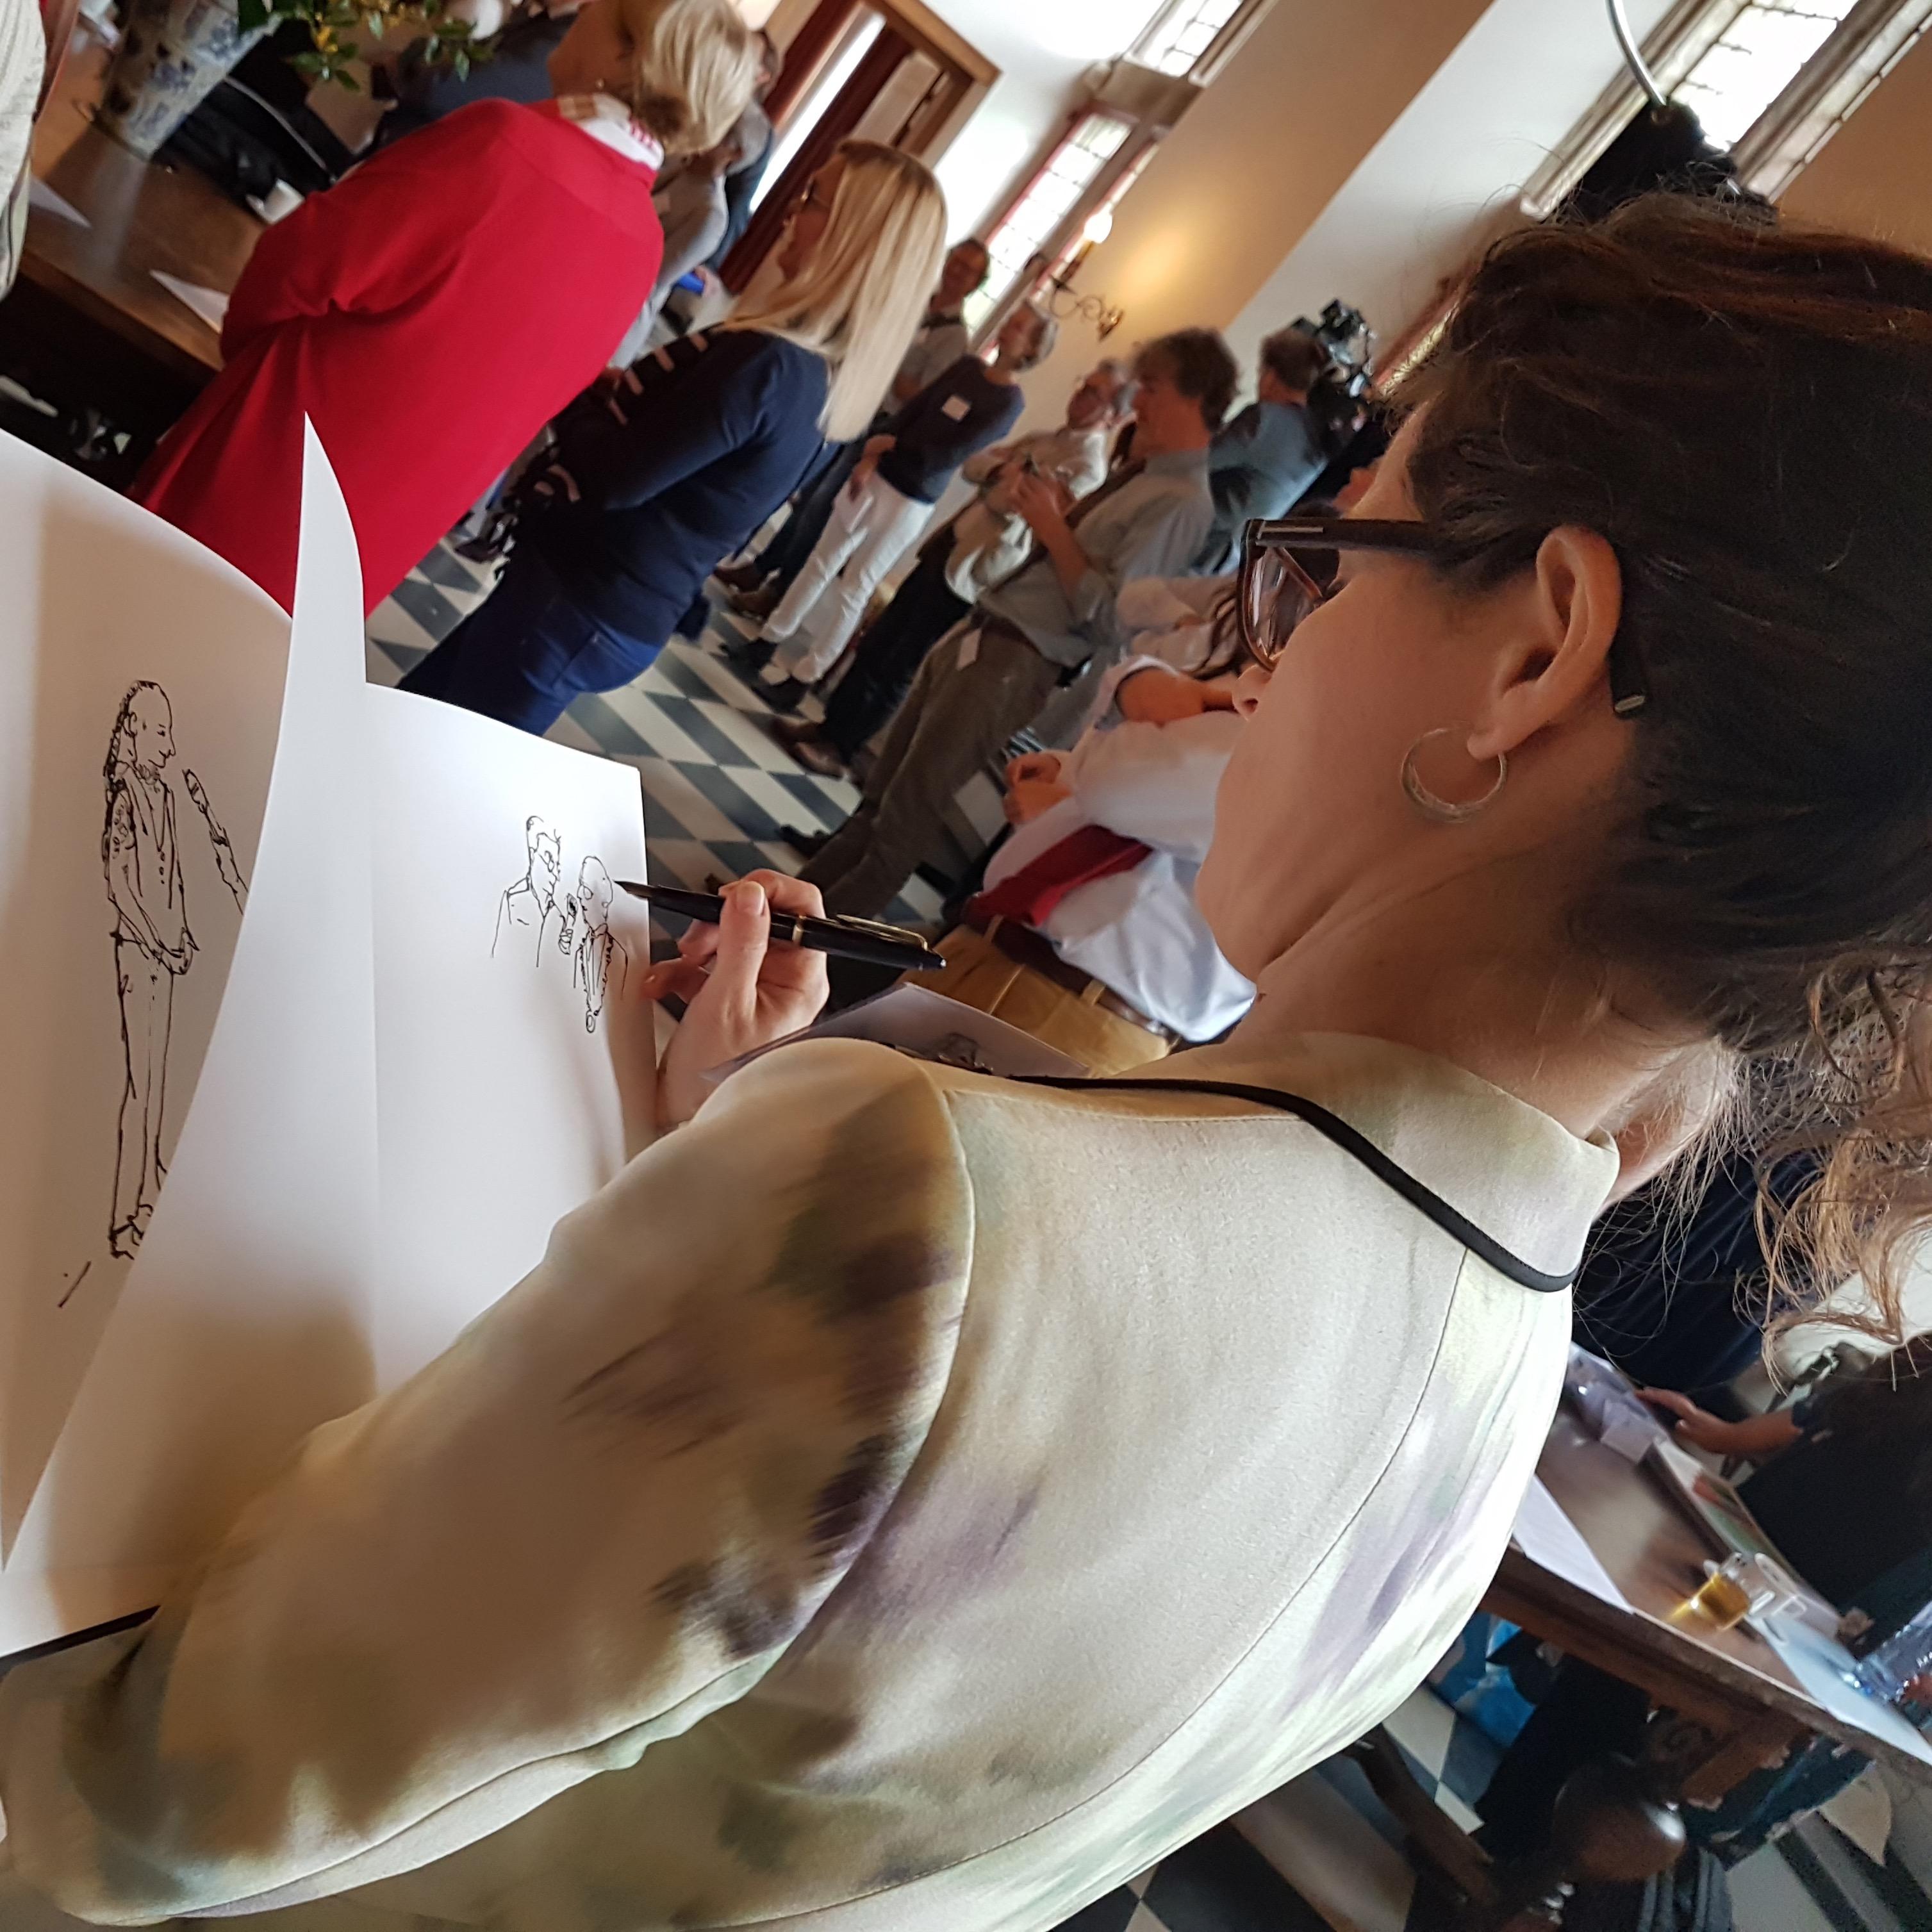 Graphic Journalism - Child Mayor Day-Drawing